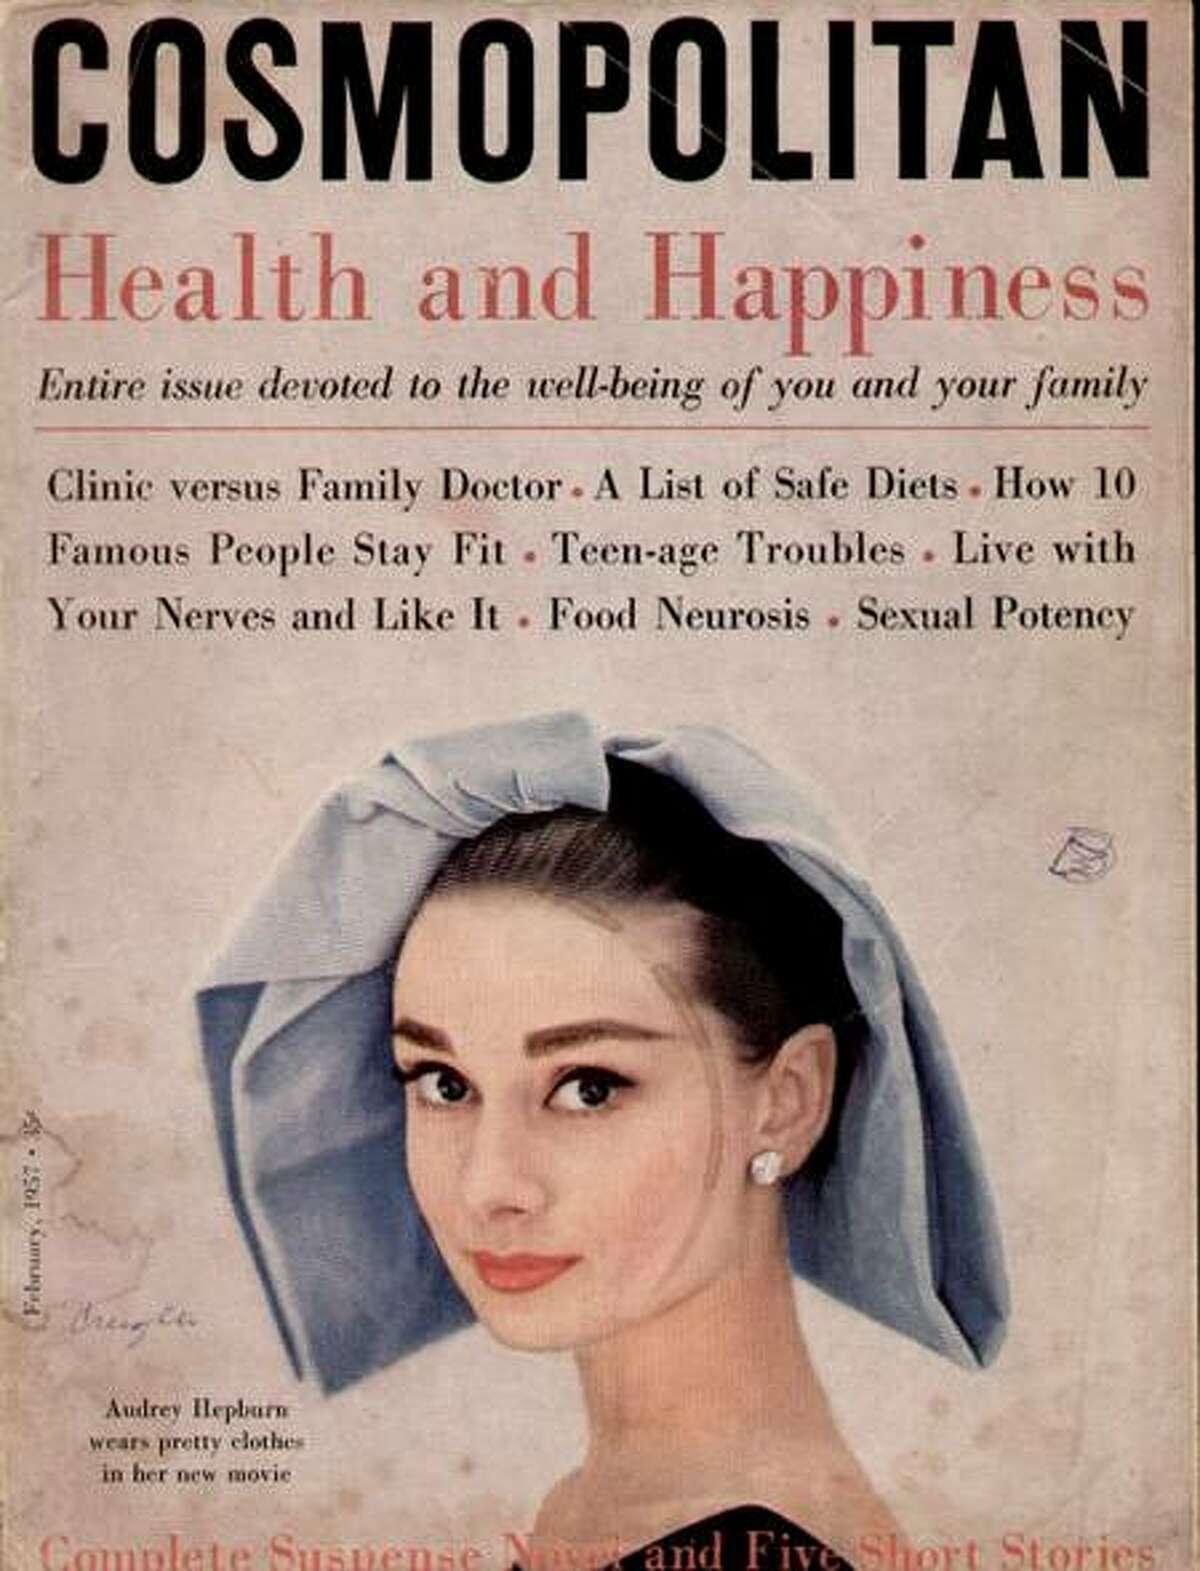 Cosmopolitan, February 1957